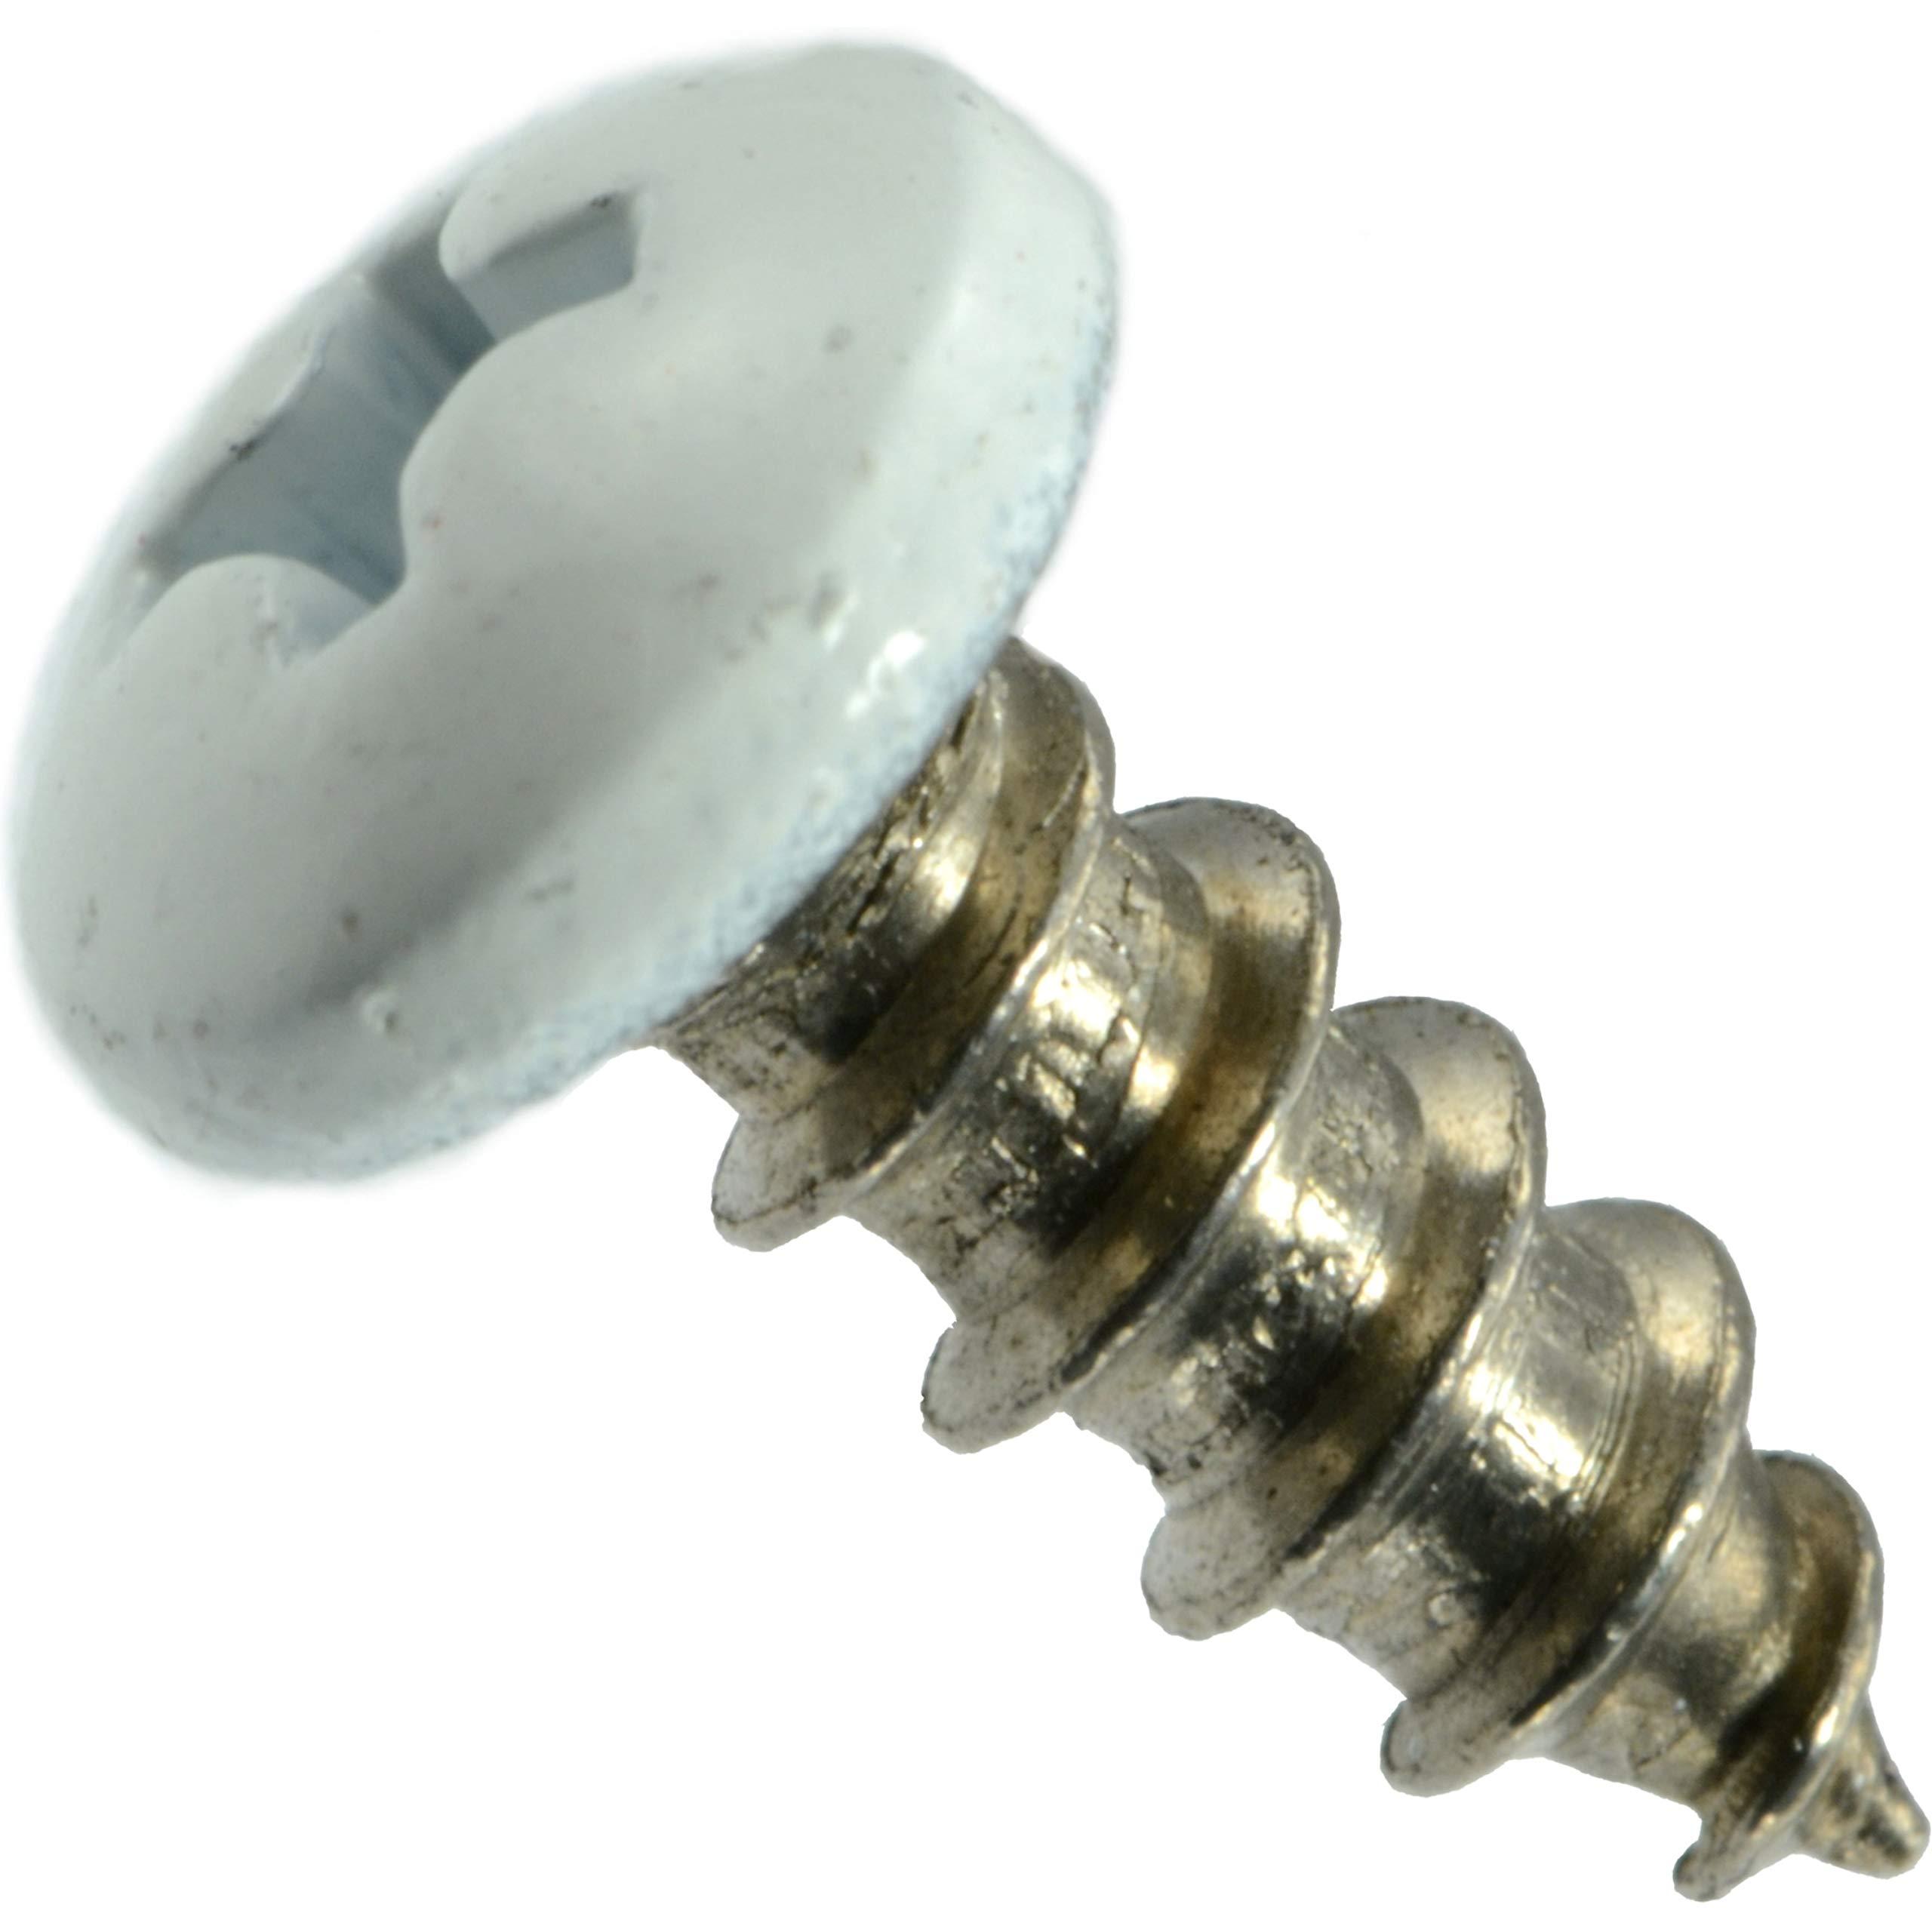 8 x 2 Hard-to-Find Fastener 014973208103 White Phillips Pan Sheet Metal Screws Piece-100